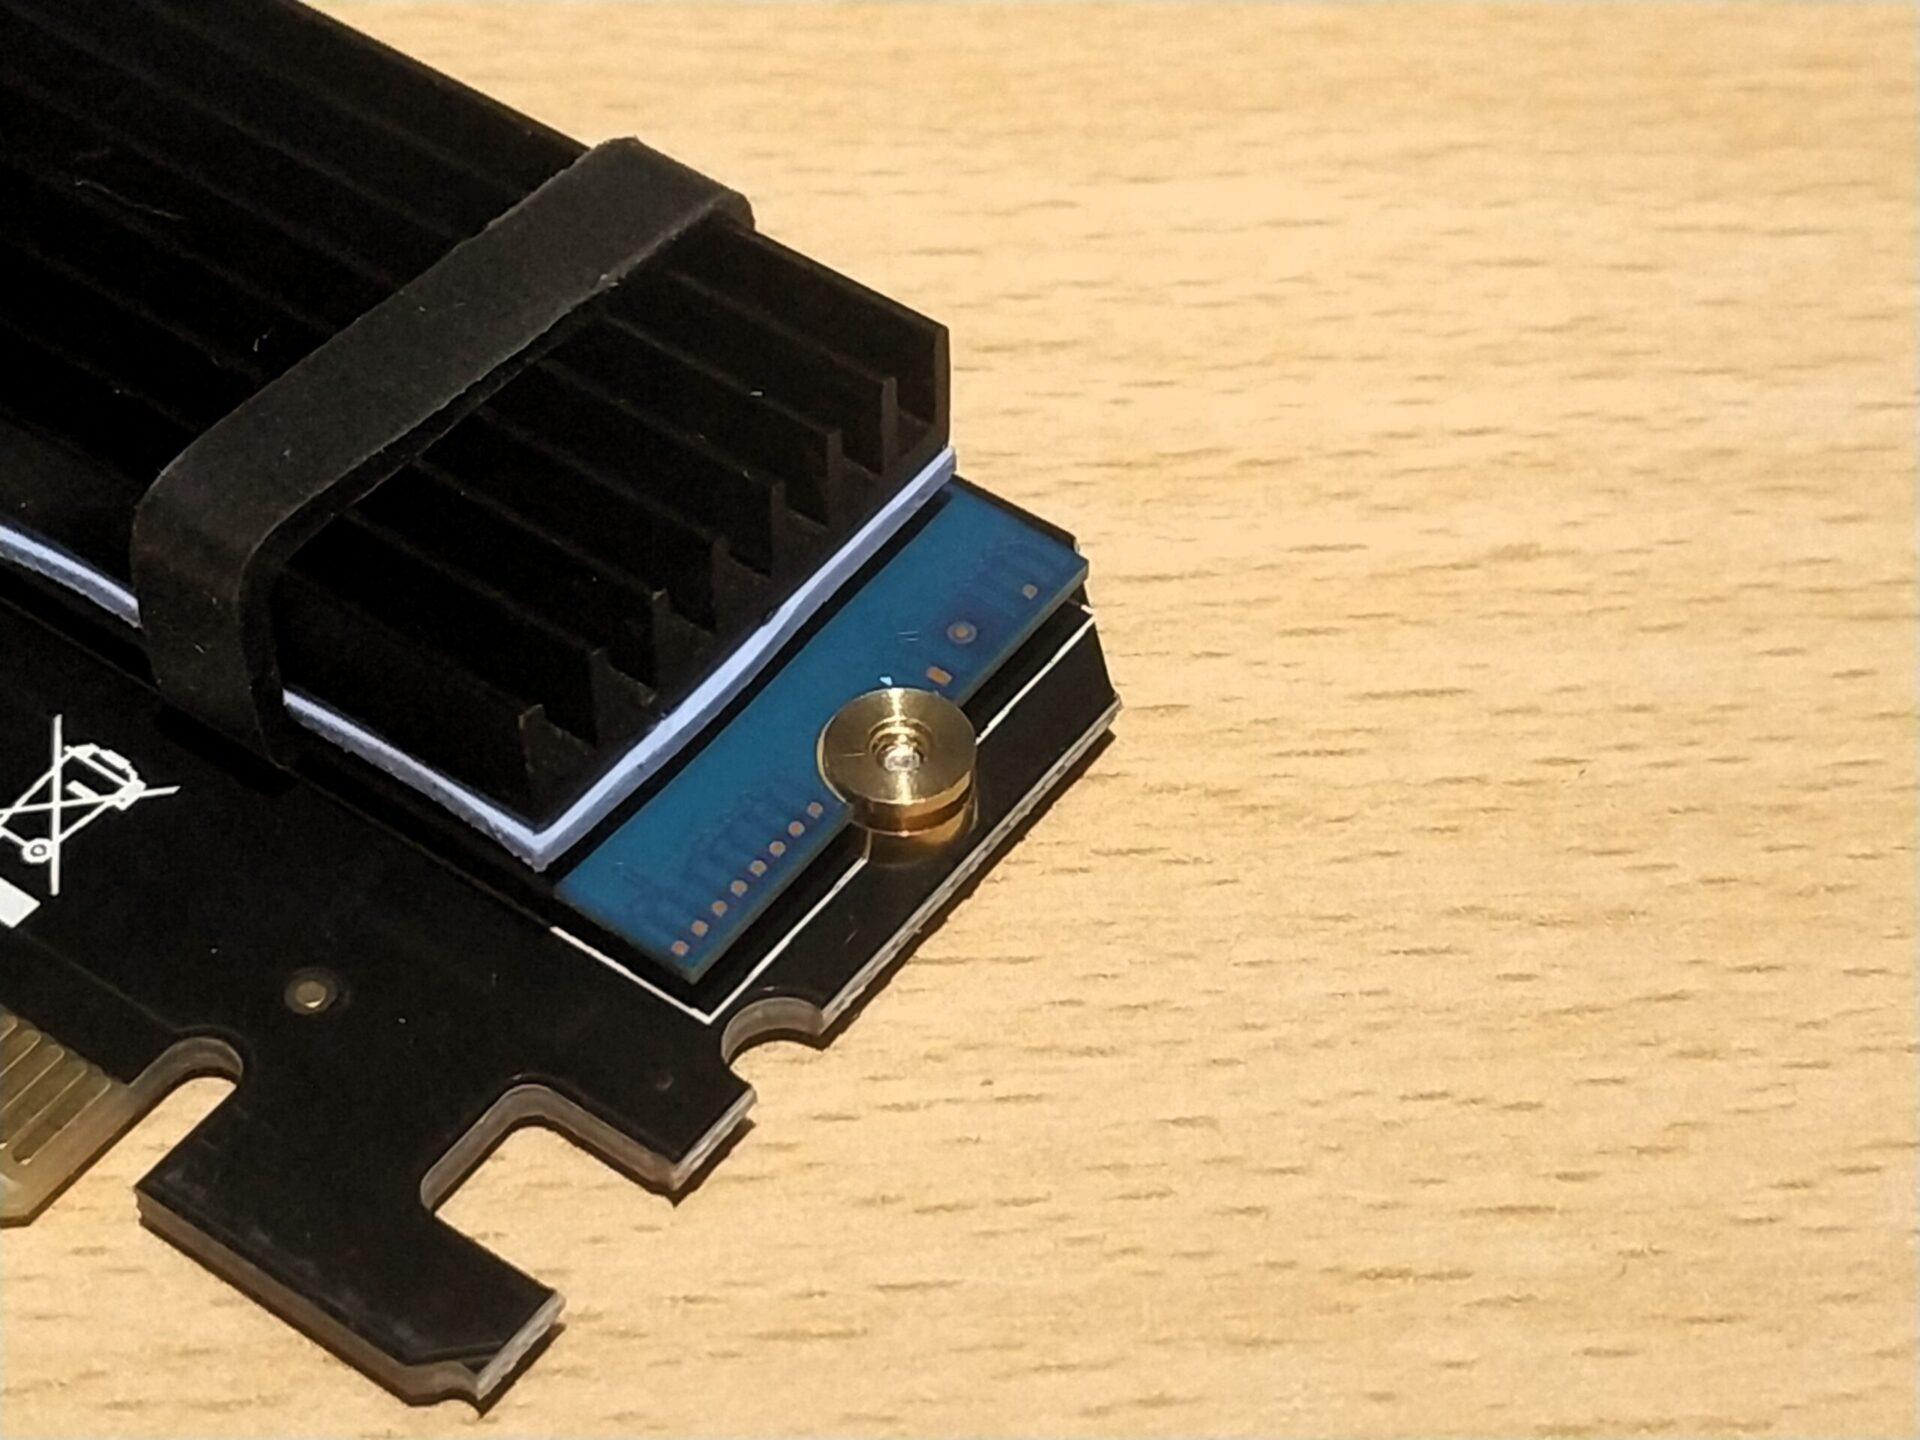 m.2 SSD auf Adapter